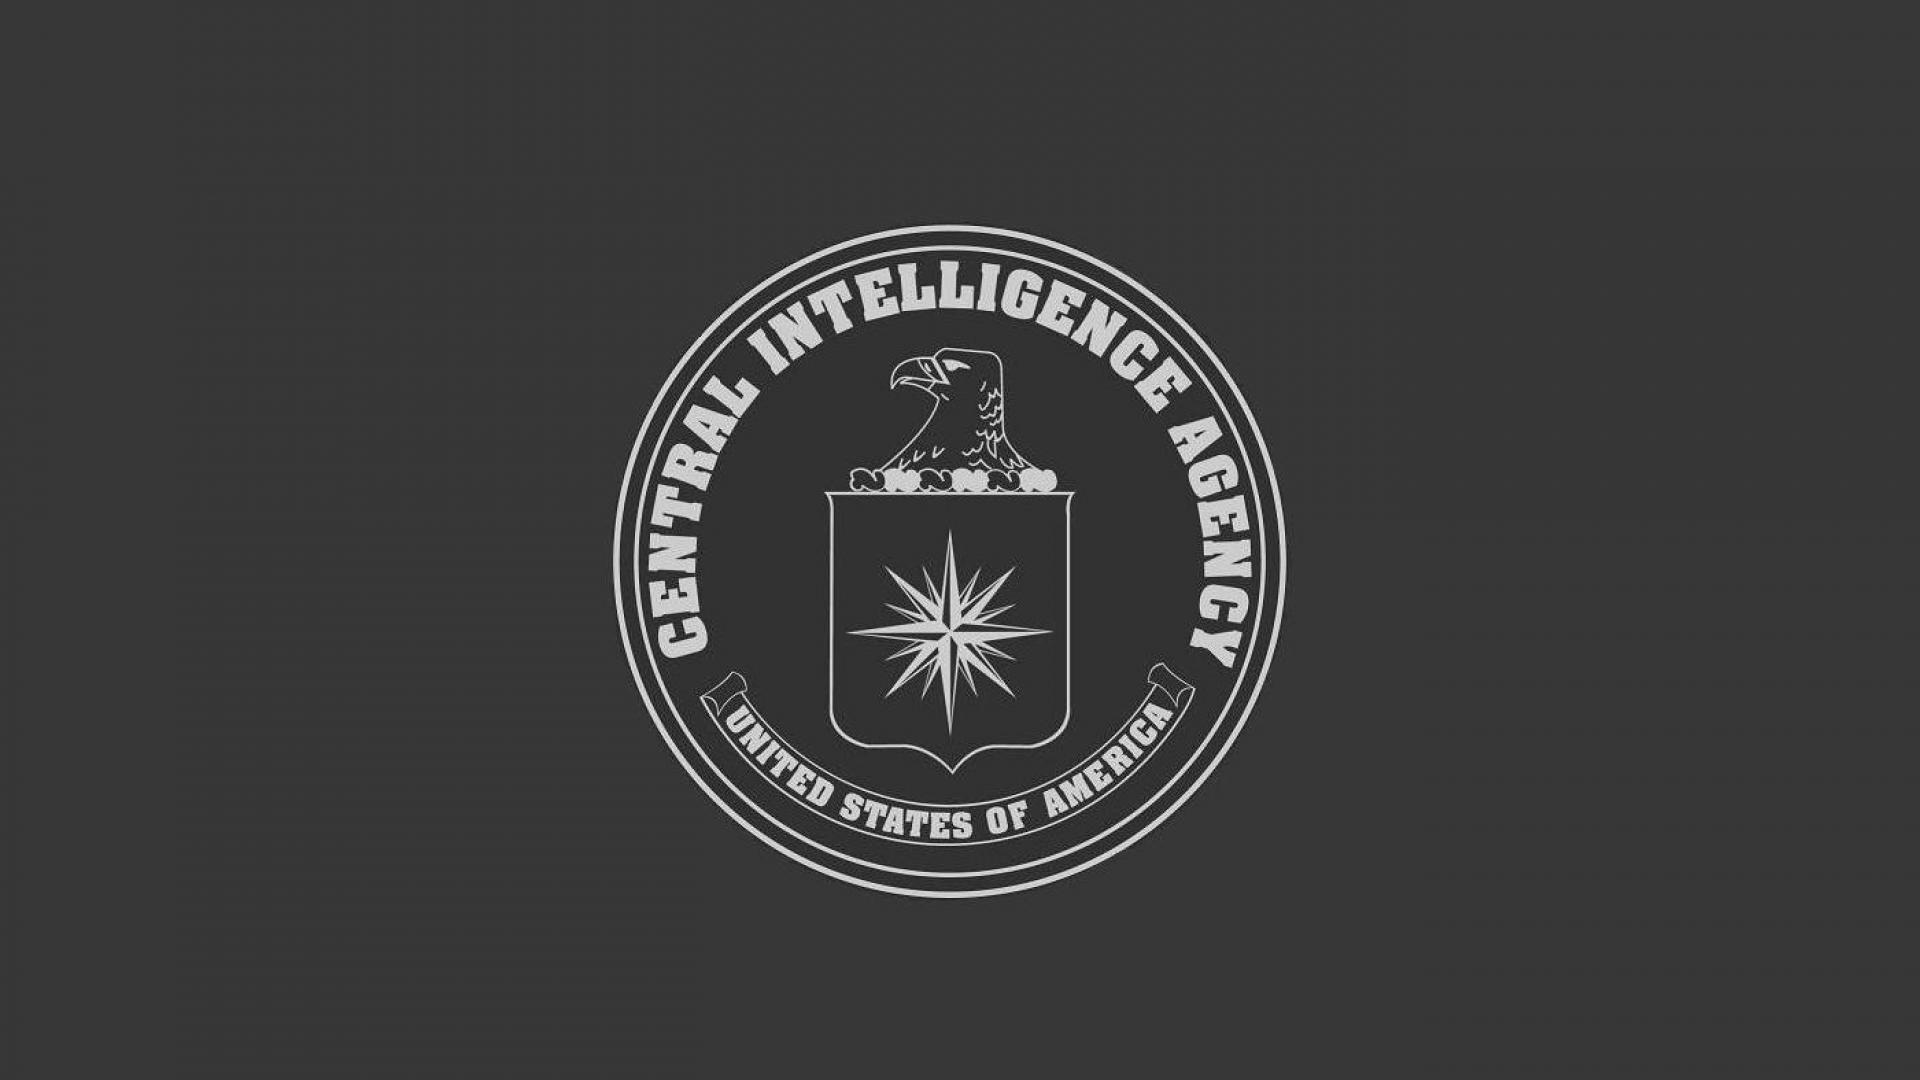 CIA Central Intelligence Agency crime usa america spy logo wallpaper      421676   WallpaperUP